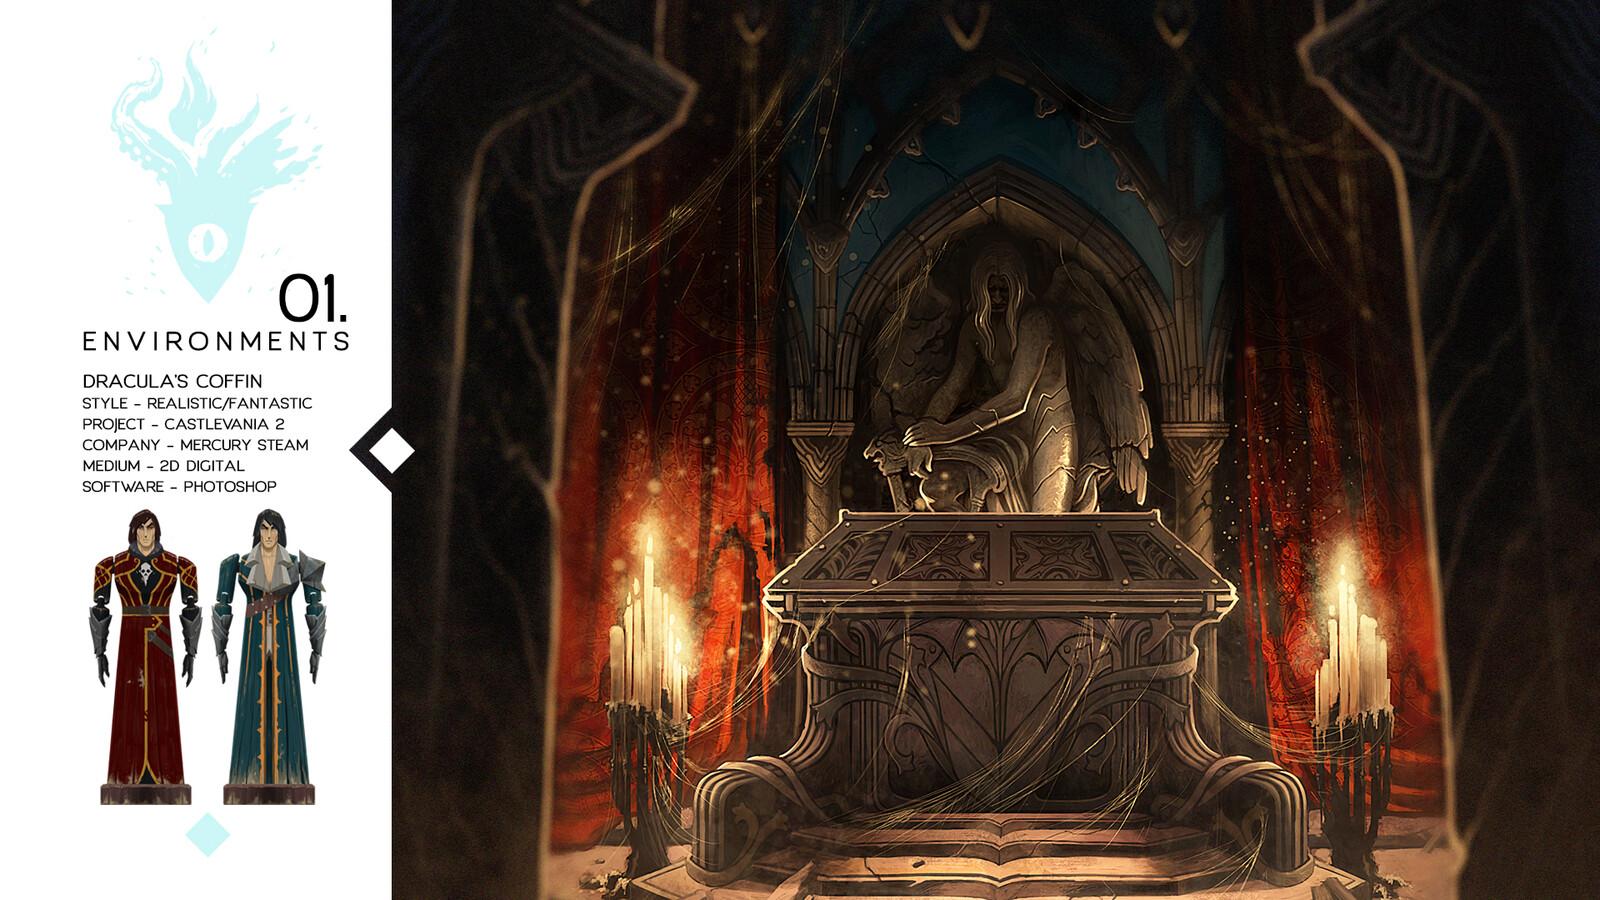 Dracula's Coffin - Castlevania Lord of Shadows II